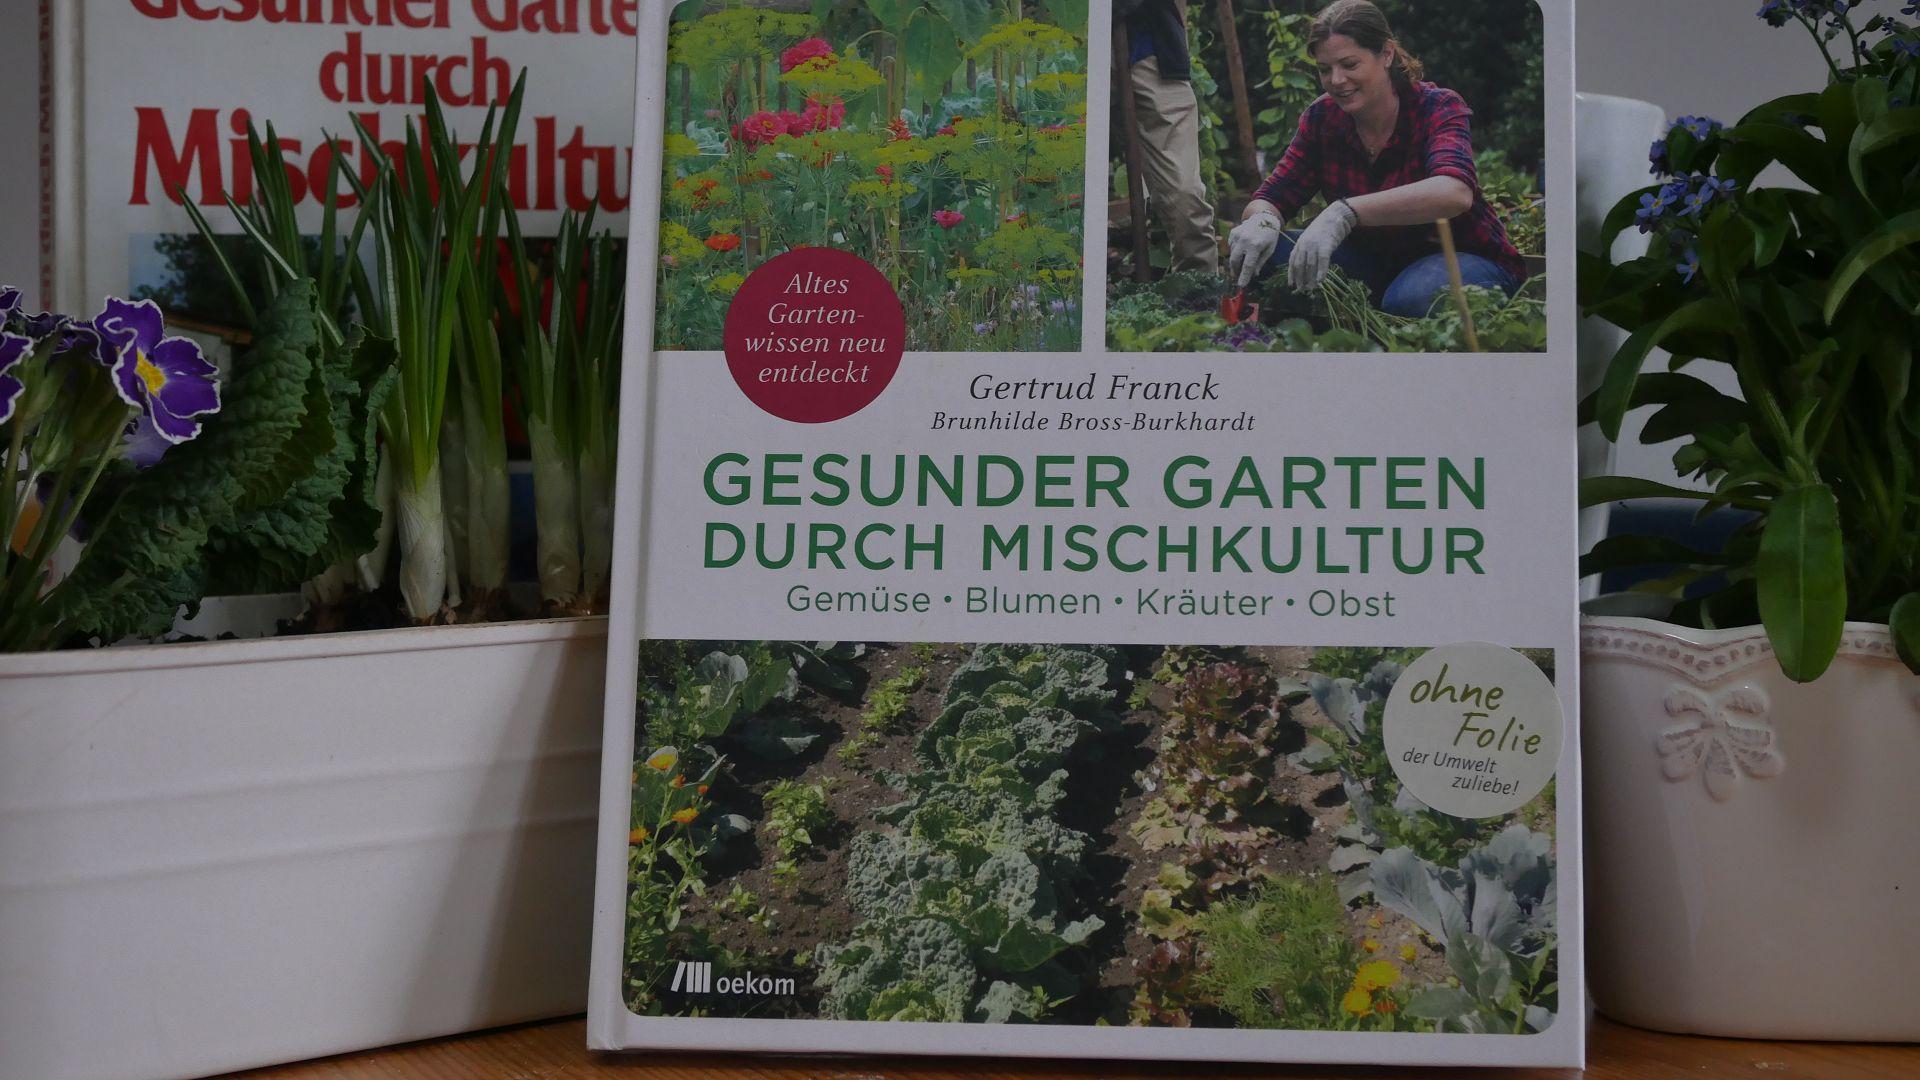 Mischkultur im Garten Buchtipp, Gertrud Franck Gesunder Garten durch Mischkultur